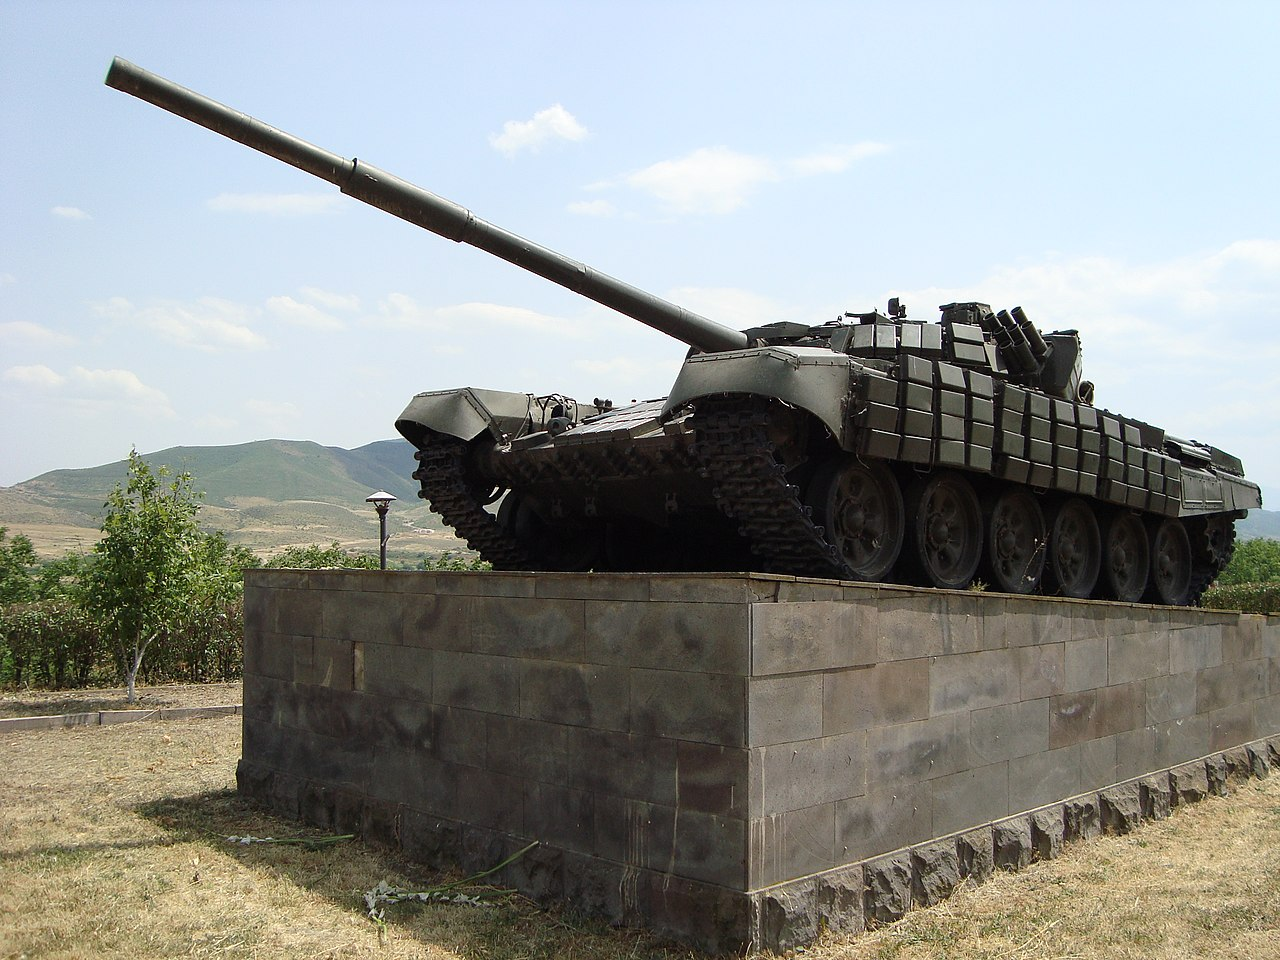 Credit: Tank Monument - Near Mayraberd (Askeran) - Nagorno-Karabakh, Adam Jones